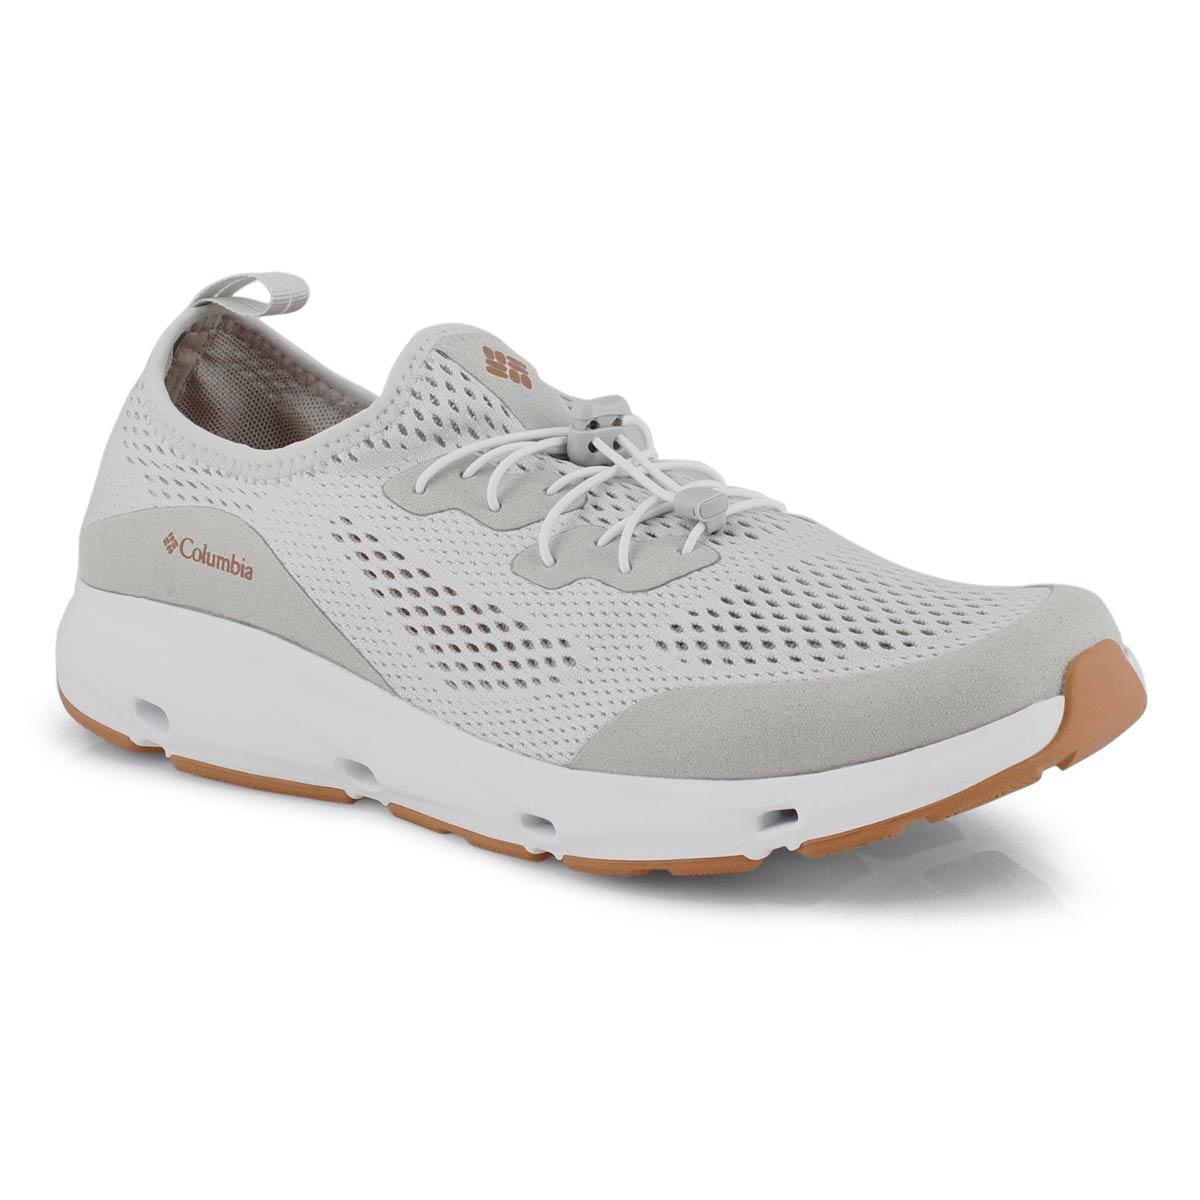 Mns Columbia Vent grey fashion sneaker